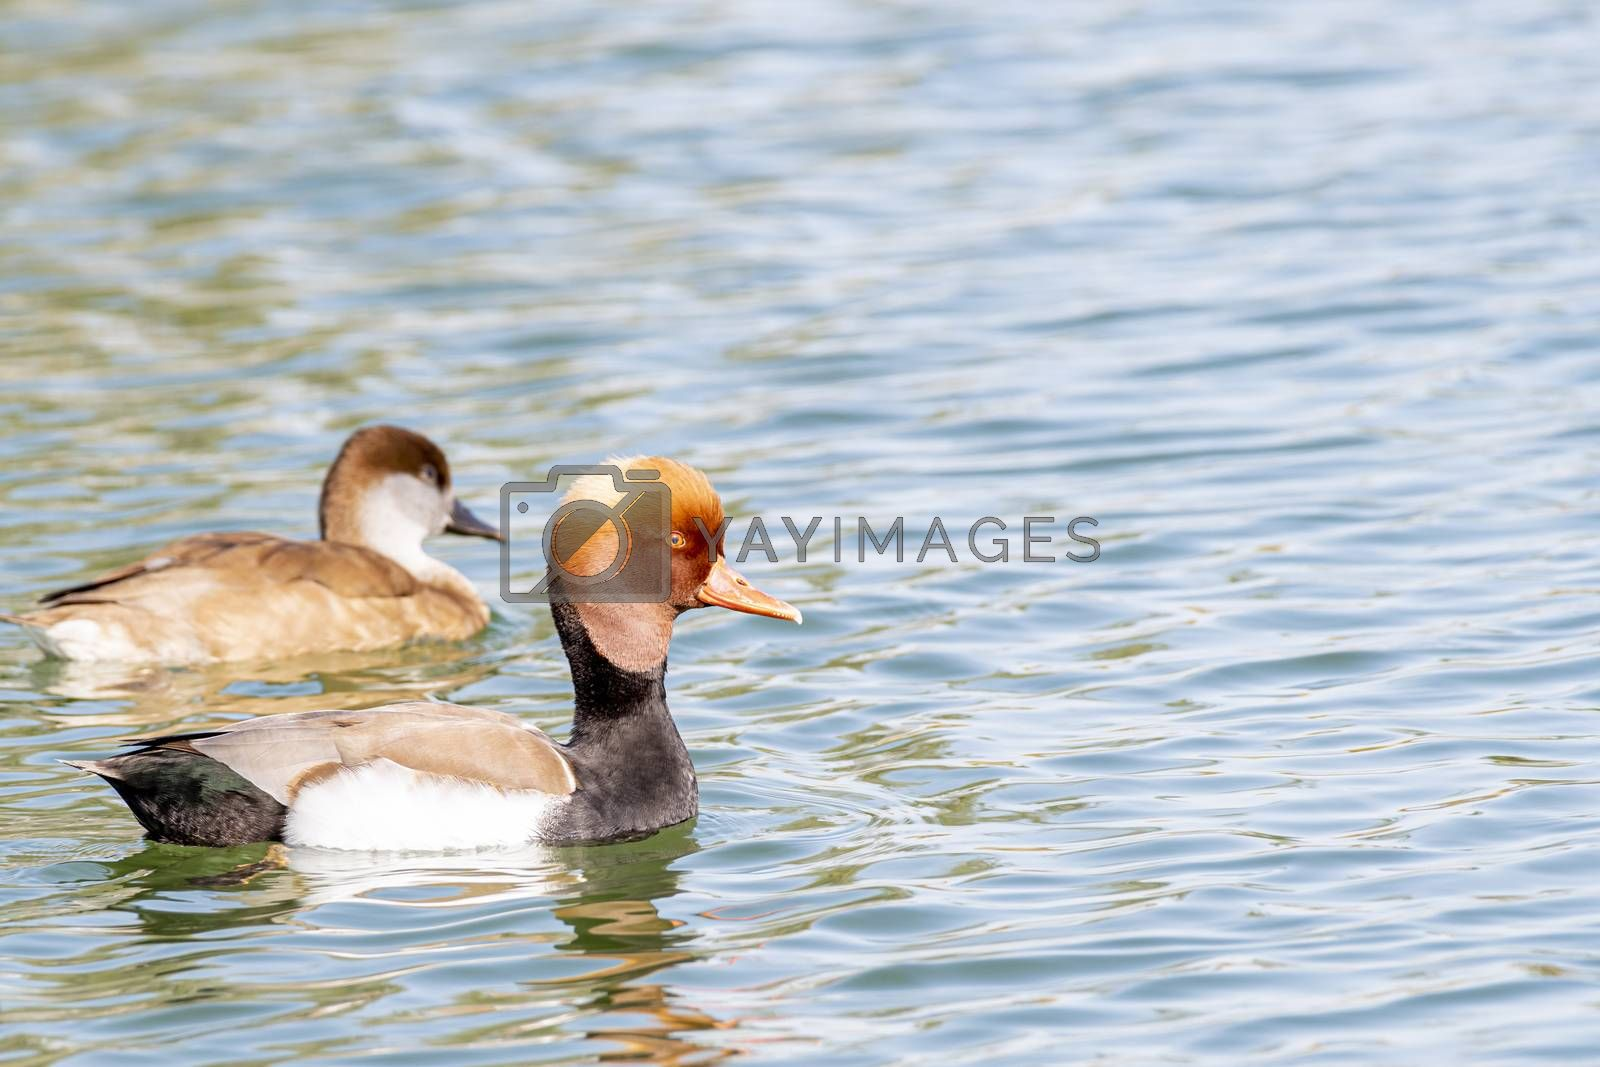 Kind of Ducks seen near Al Qudra Lakes, Dubai, United Arab Emirates (UAE), Middle East, Arabian Peninsula